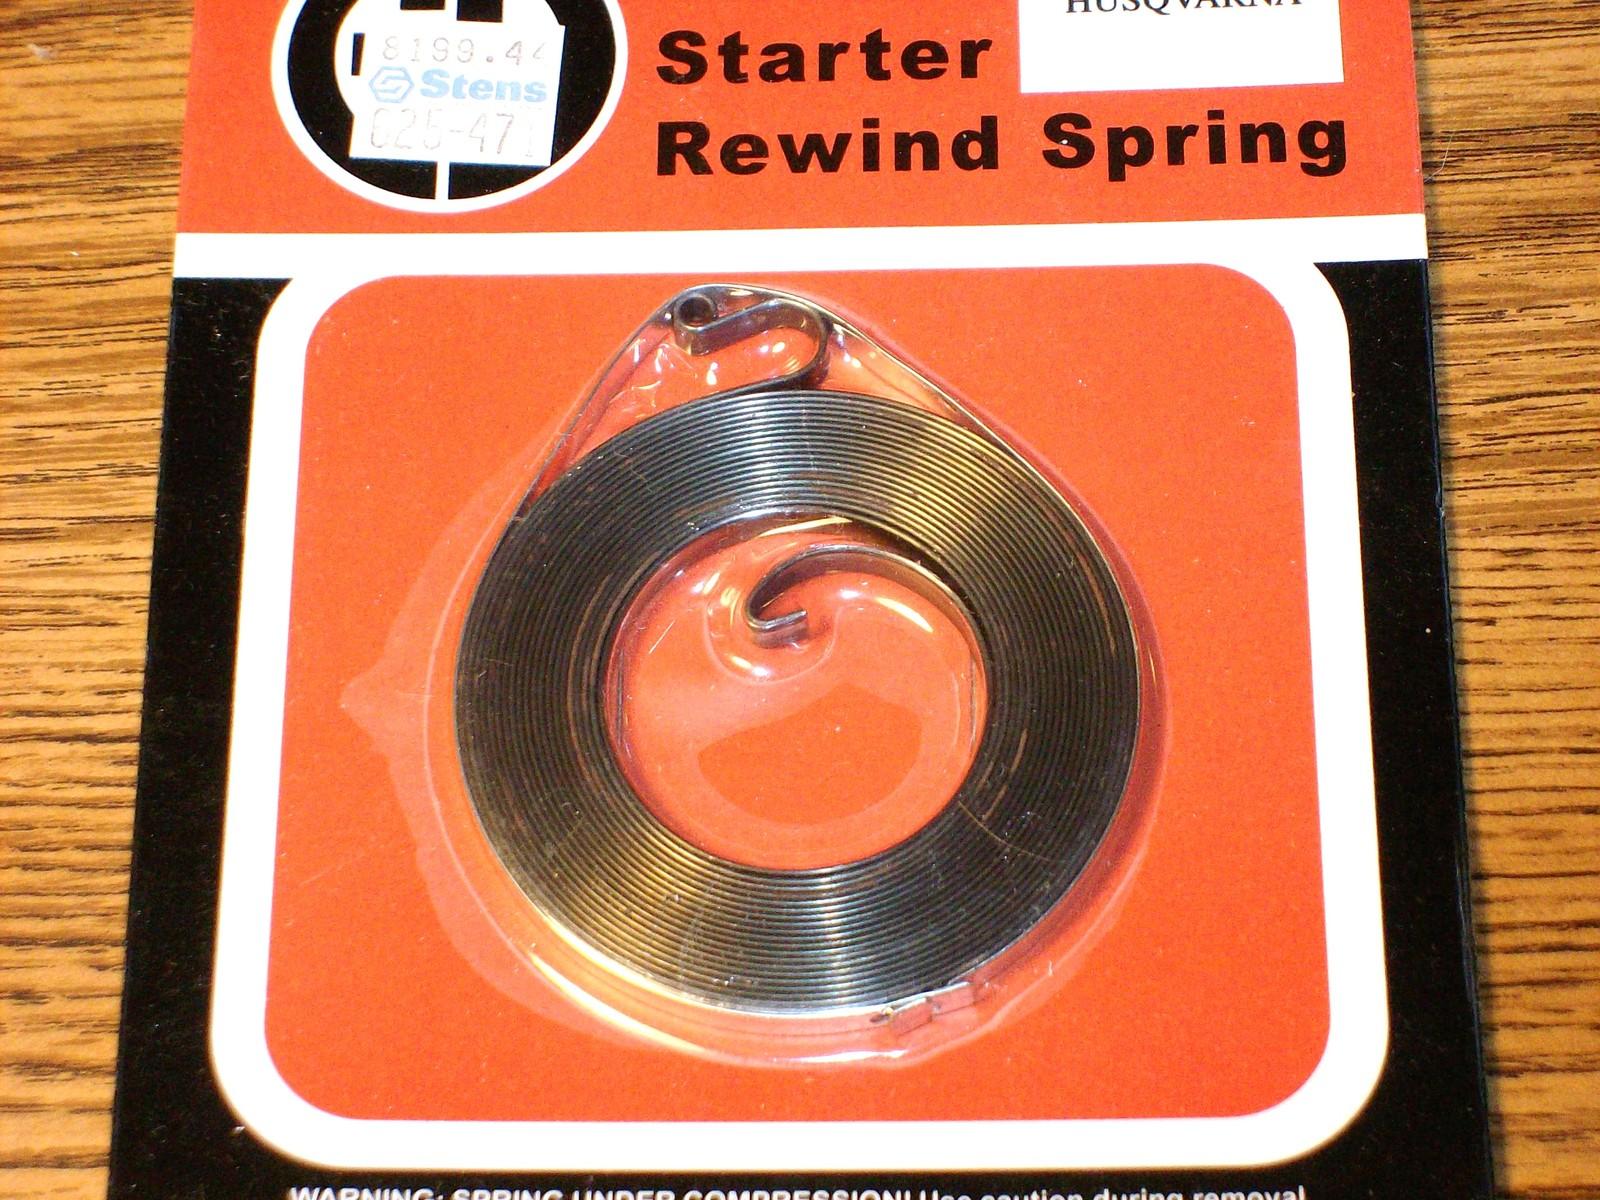 Husqvarna 140, 165R, 240, 244, 340 chainsaw recoil starter spring 501460402 - $9.97